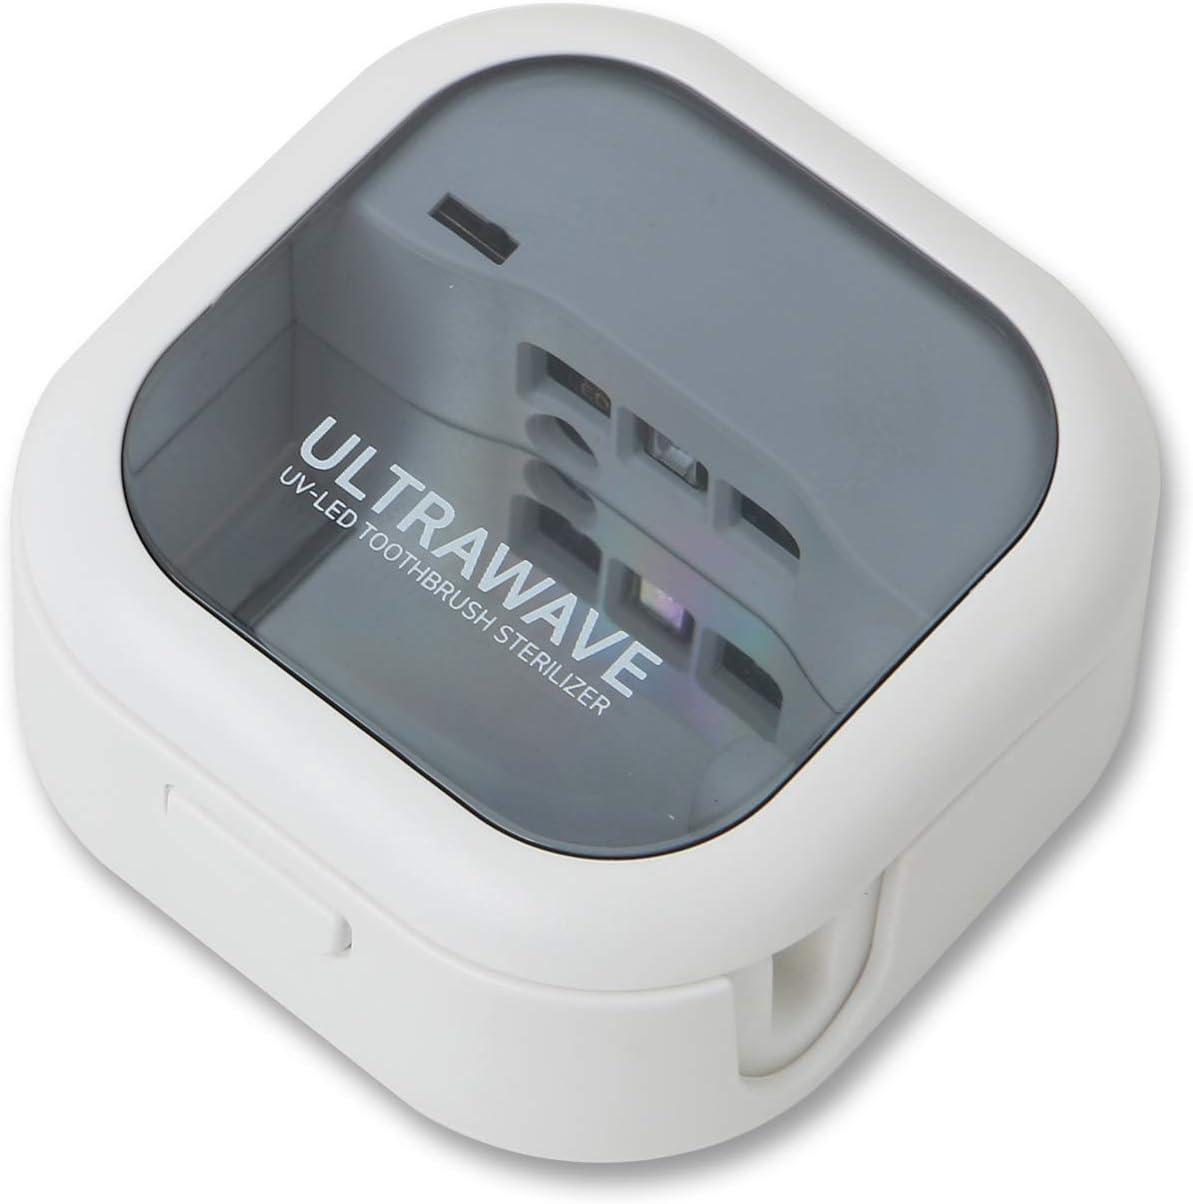 UV-C 歯ブラシ除菌器 ULTRA WAVE 紫外線LED 99.9%除菌 MEDIK 歯ブラシ除菌キャップ 小型 軽量 携帯に最適 ホワイト MDK-TS03(WHITE)